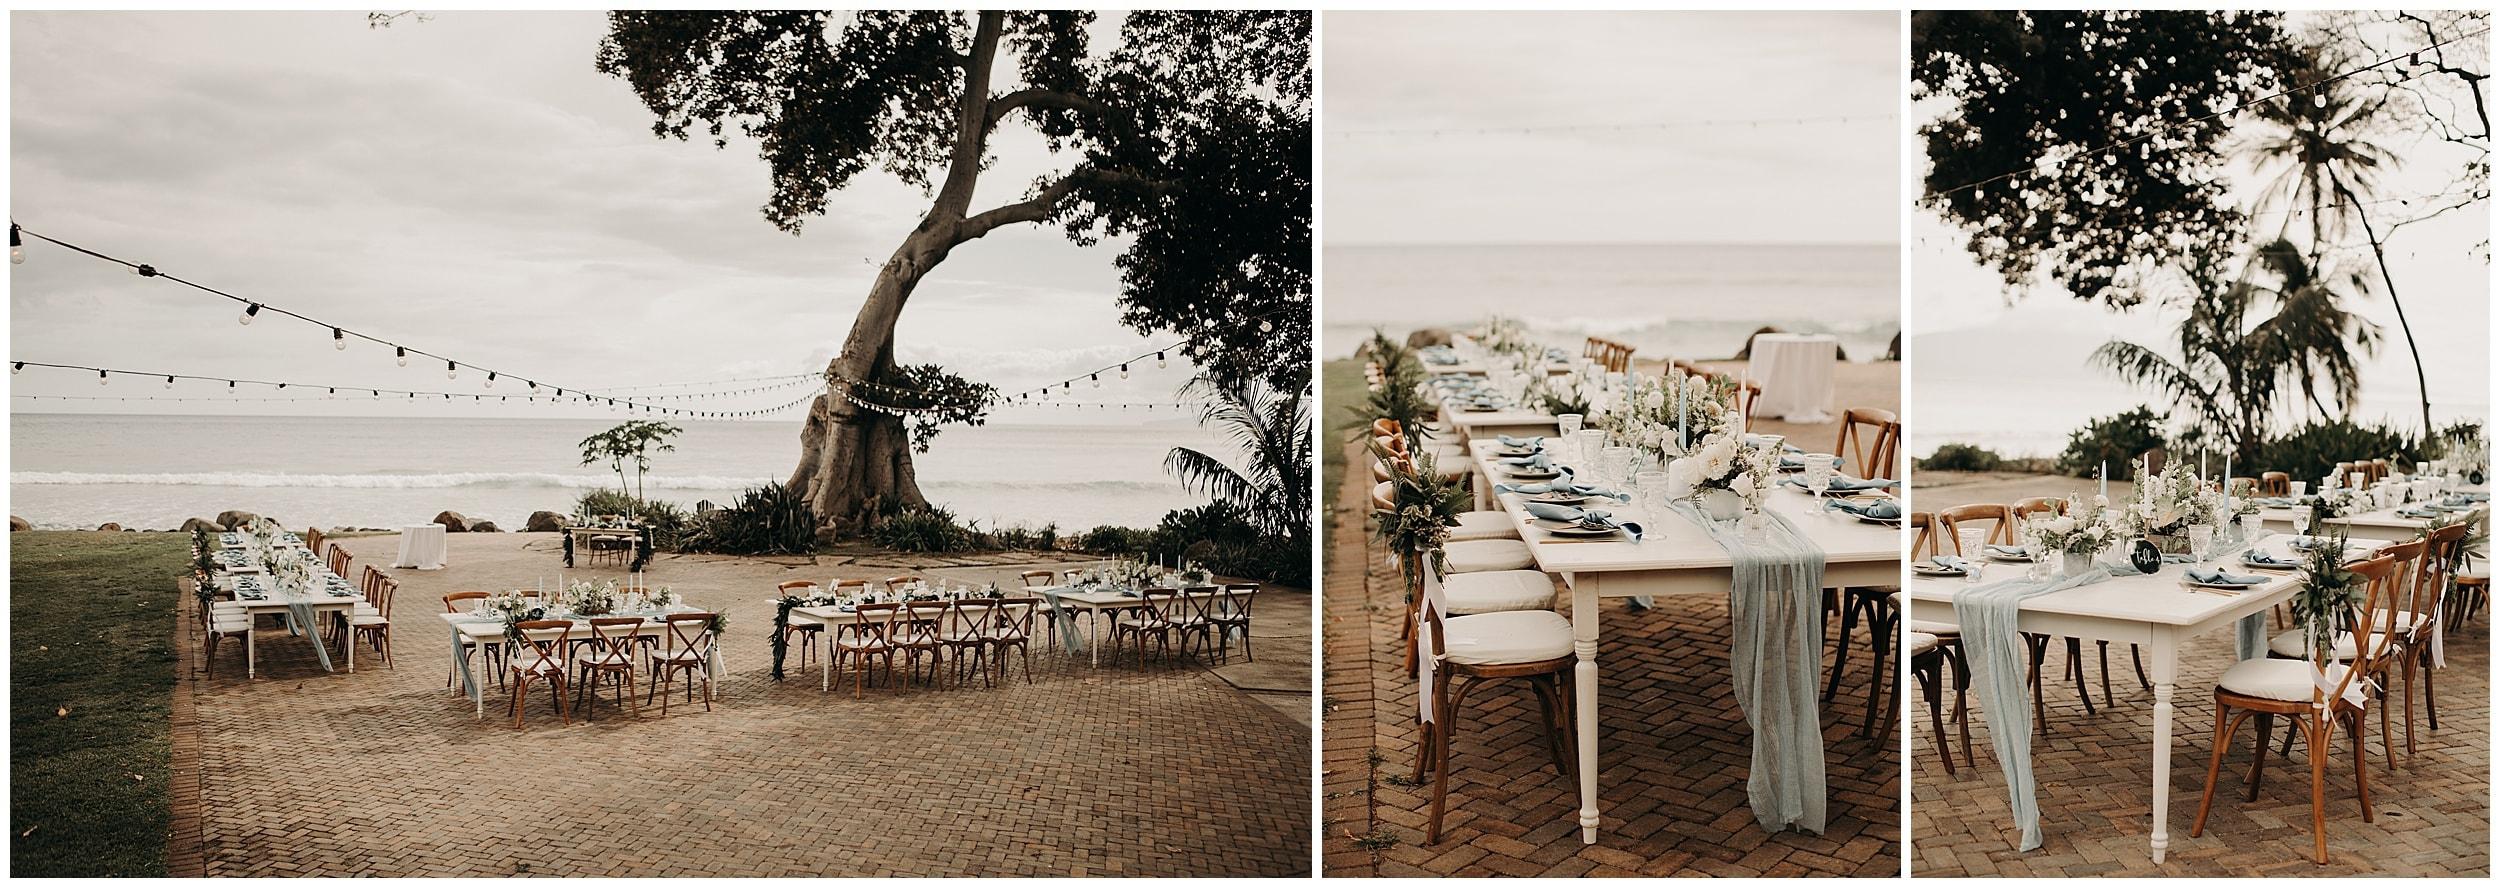 Maui wedding photography-10-11_0037